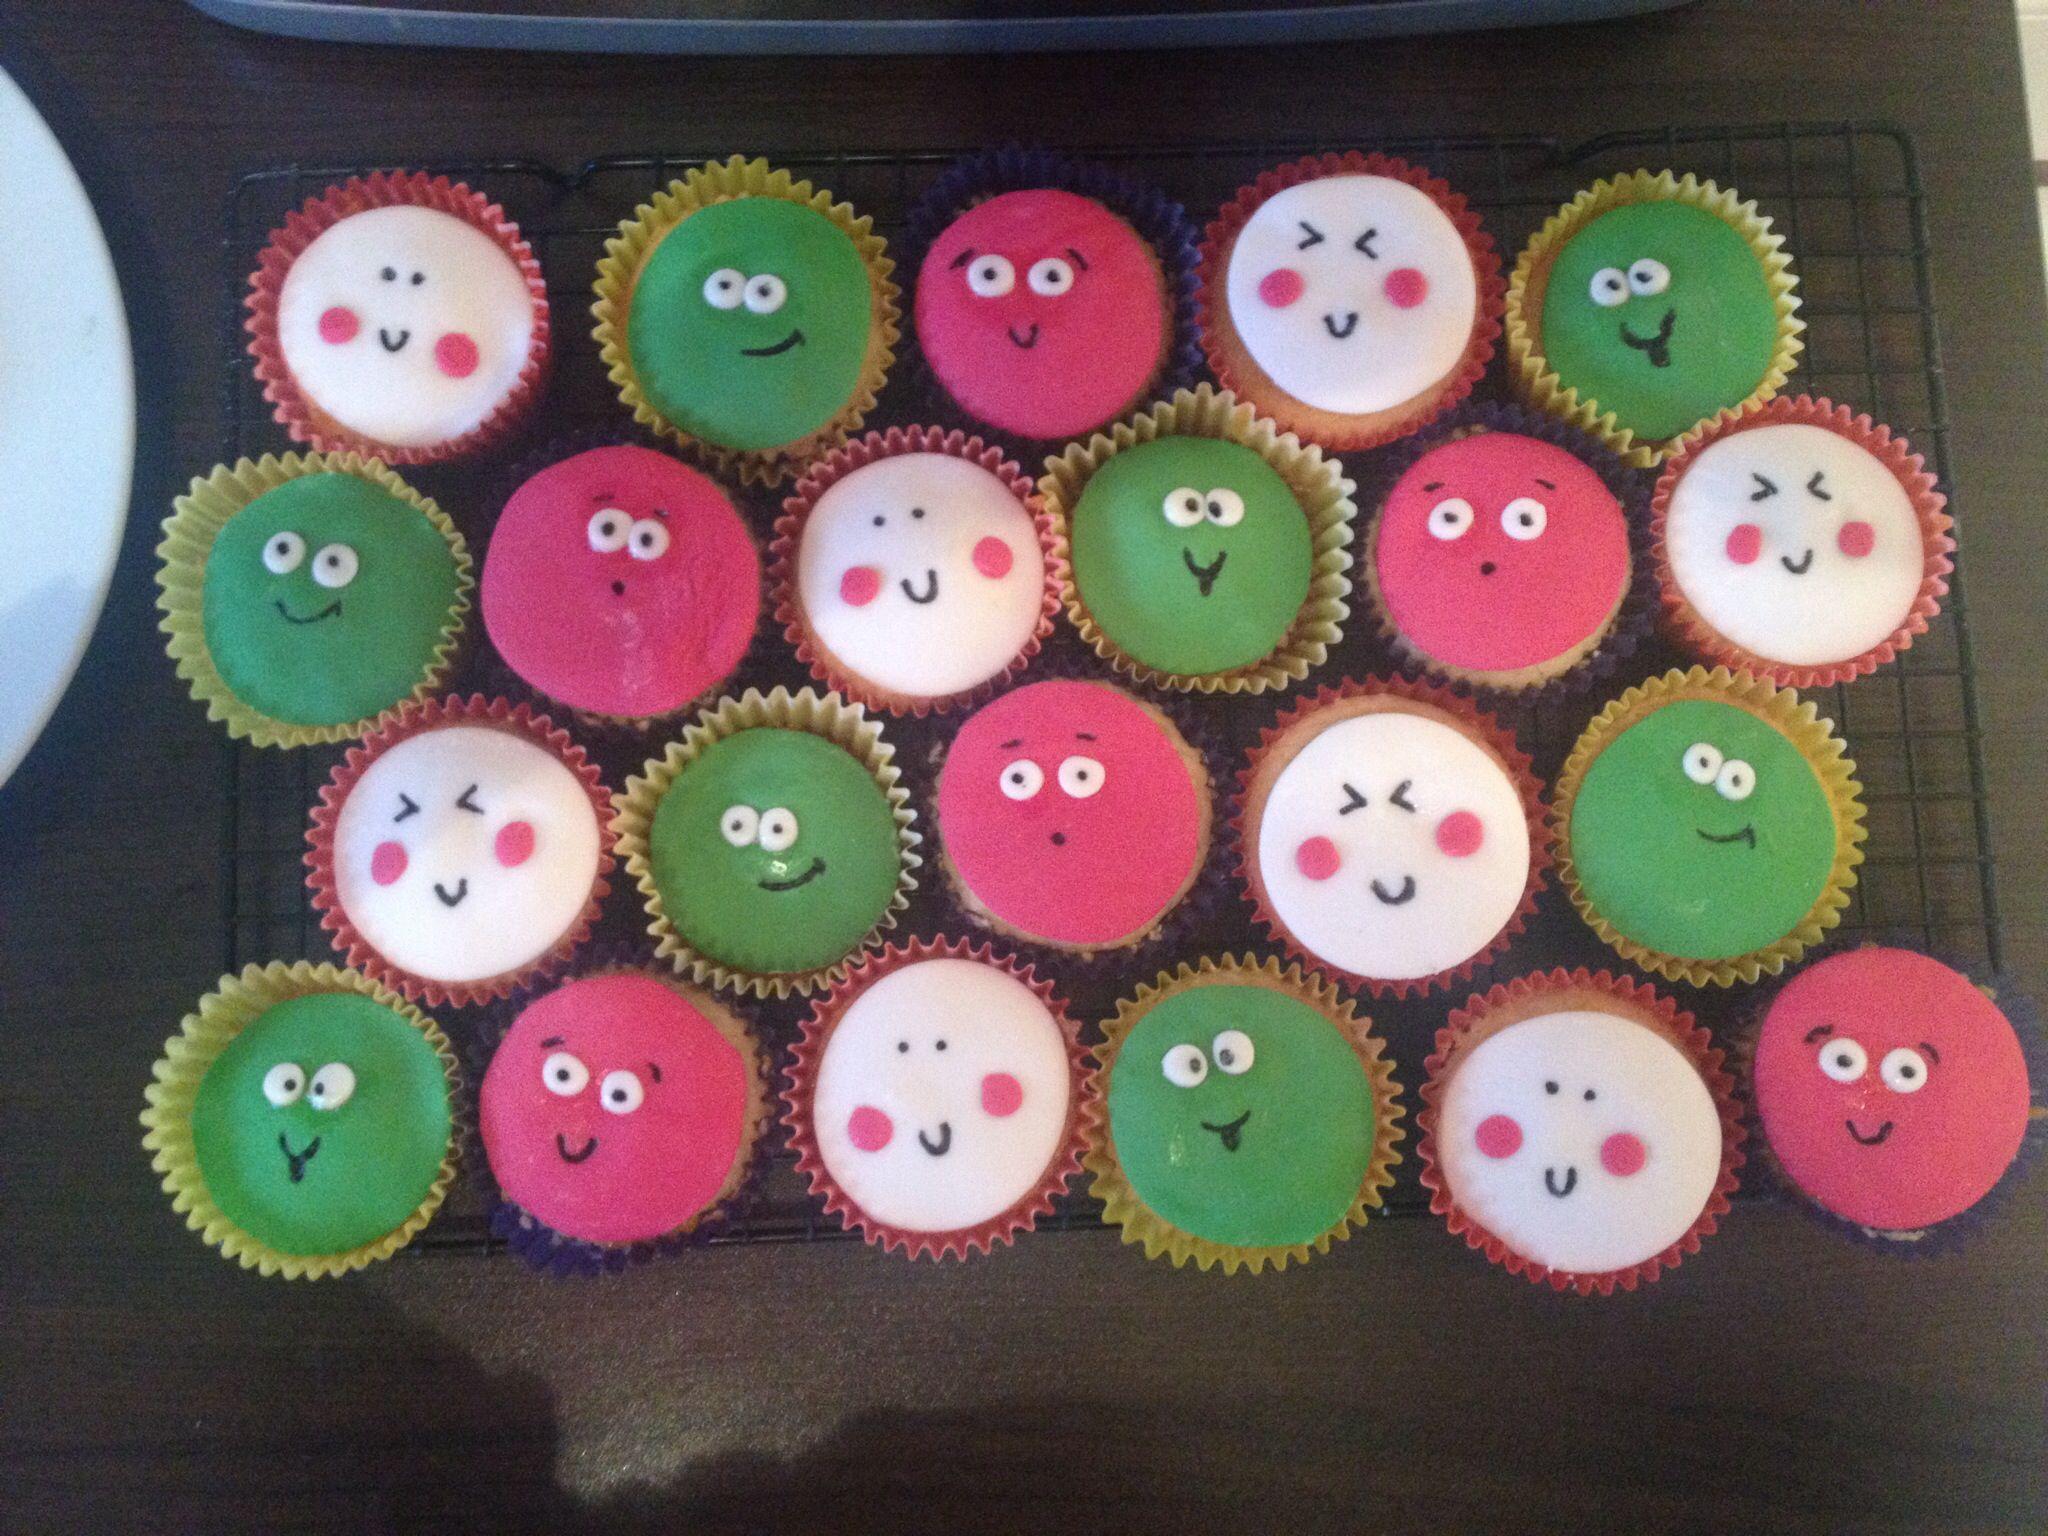 Cupcakes for my boys school Xmas party tomorrow :-) xx